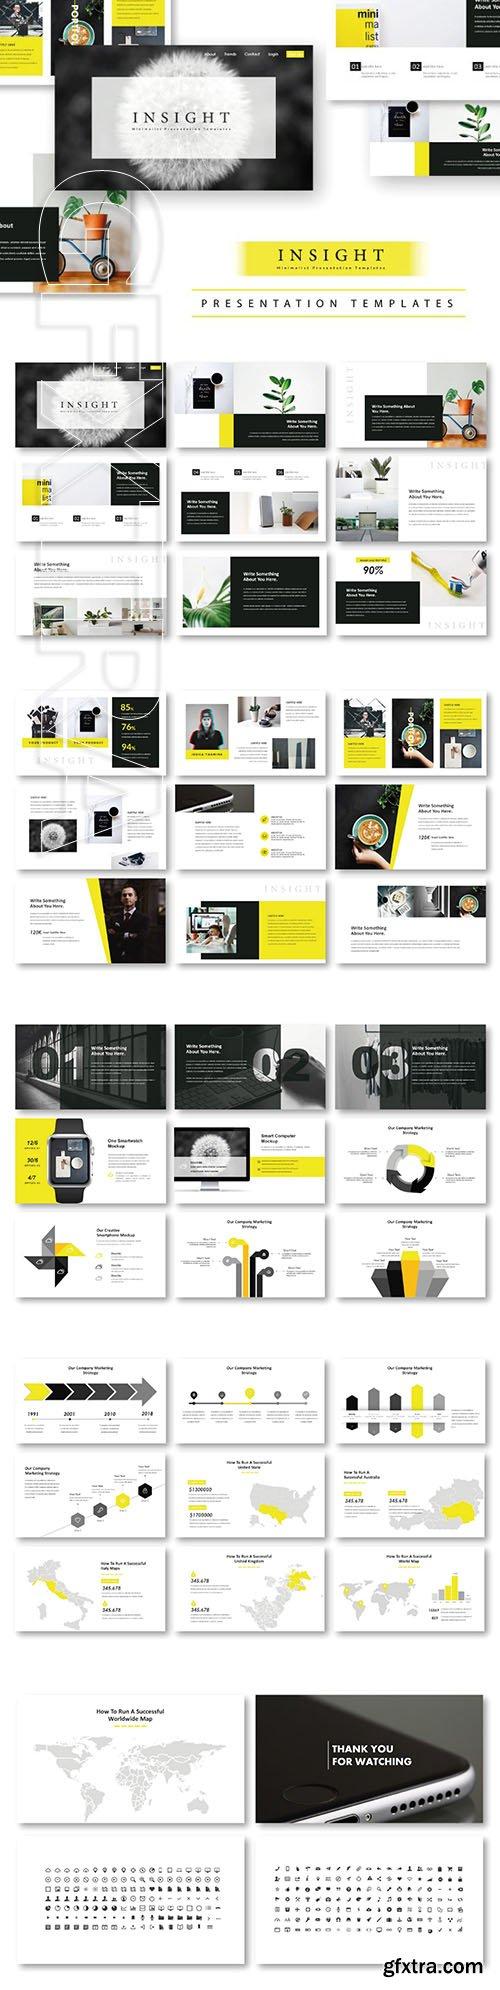 CreativeMarket - Insight Minimal PowerPoint Template 2901867